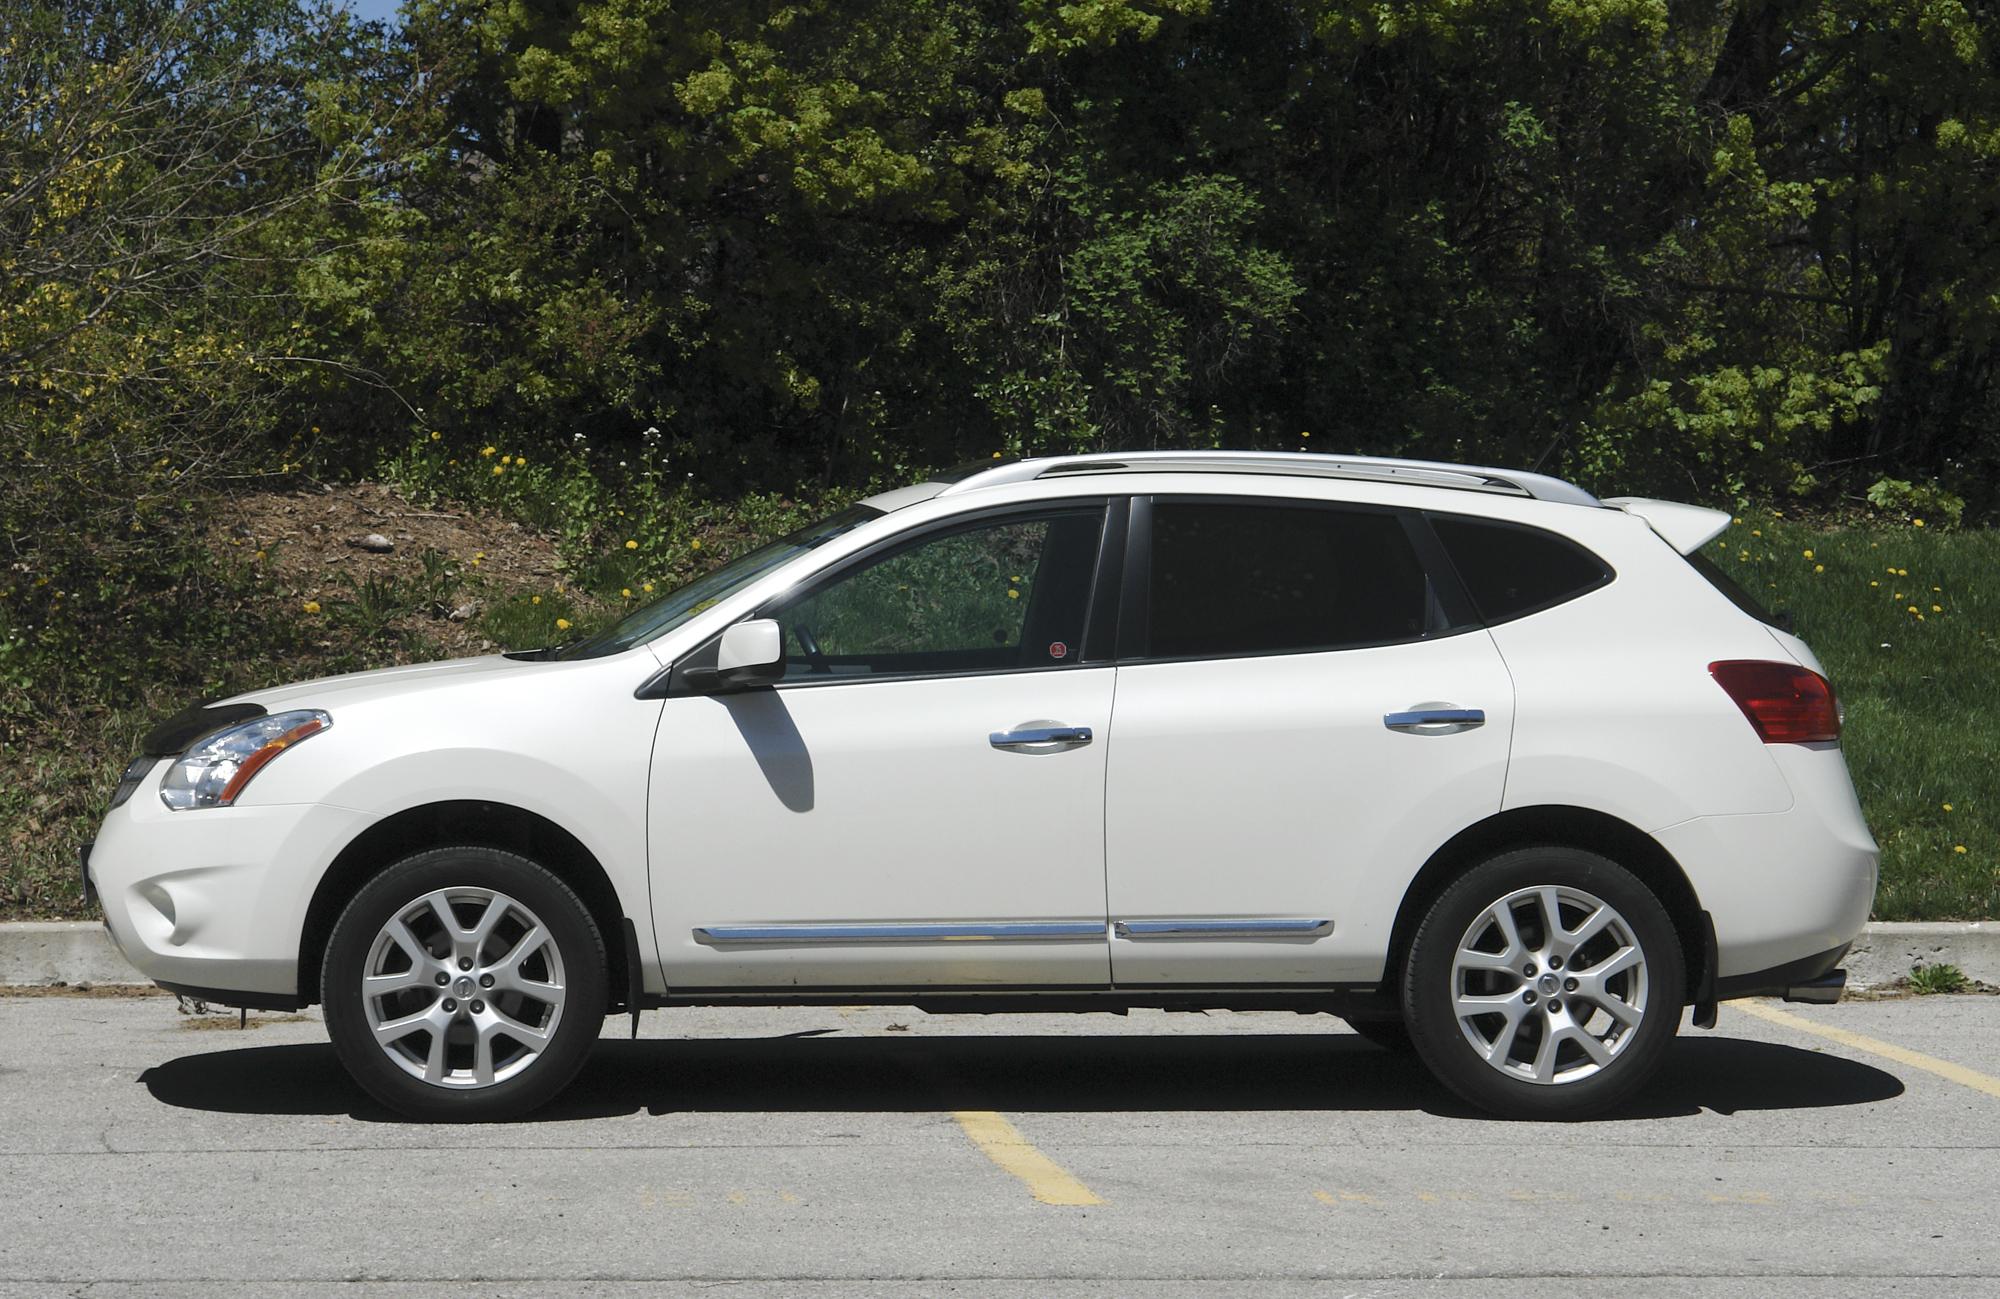 Nissan Rogue I 2007 - 2010 SUV 5 door #5